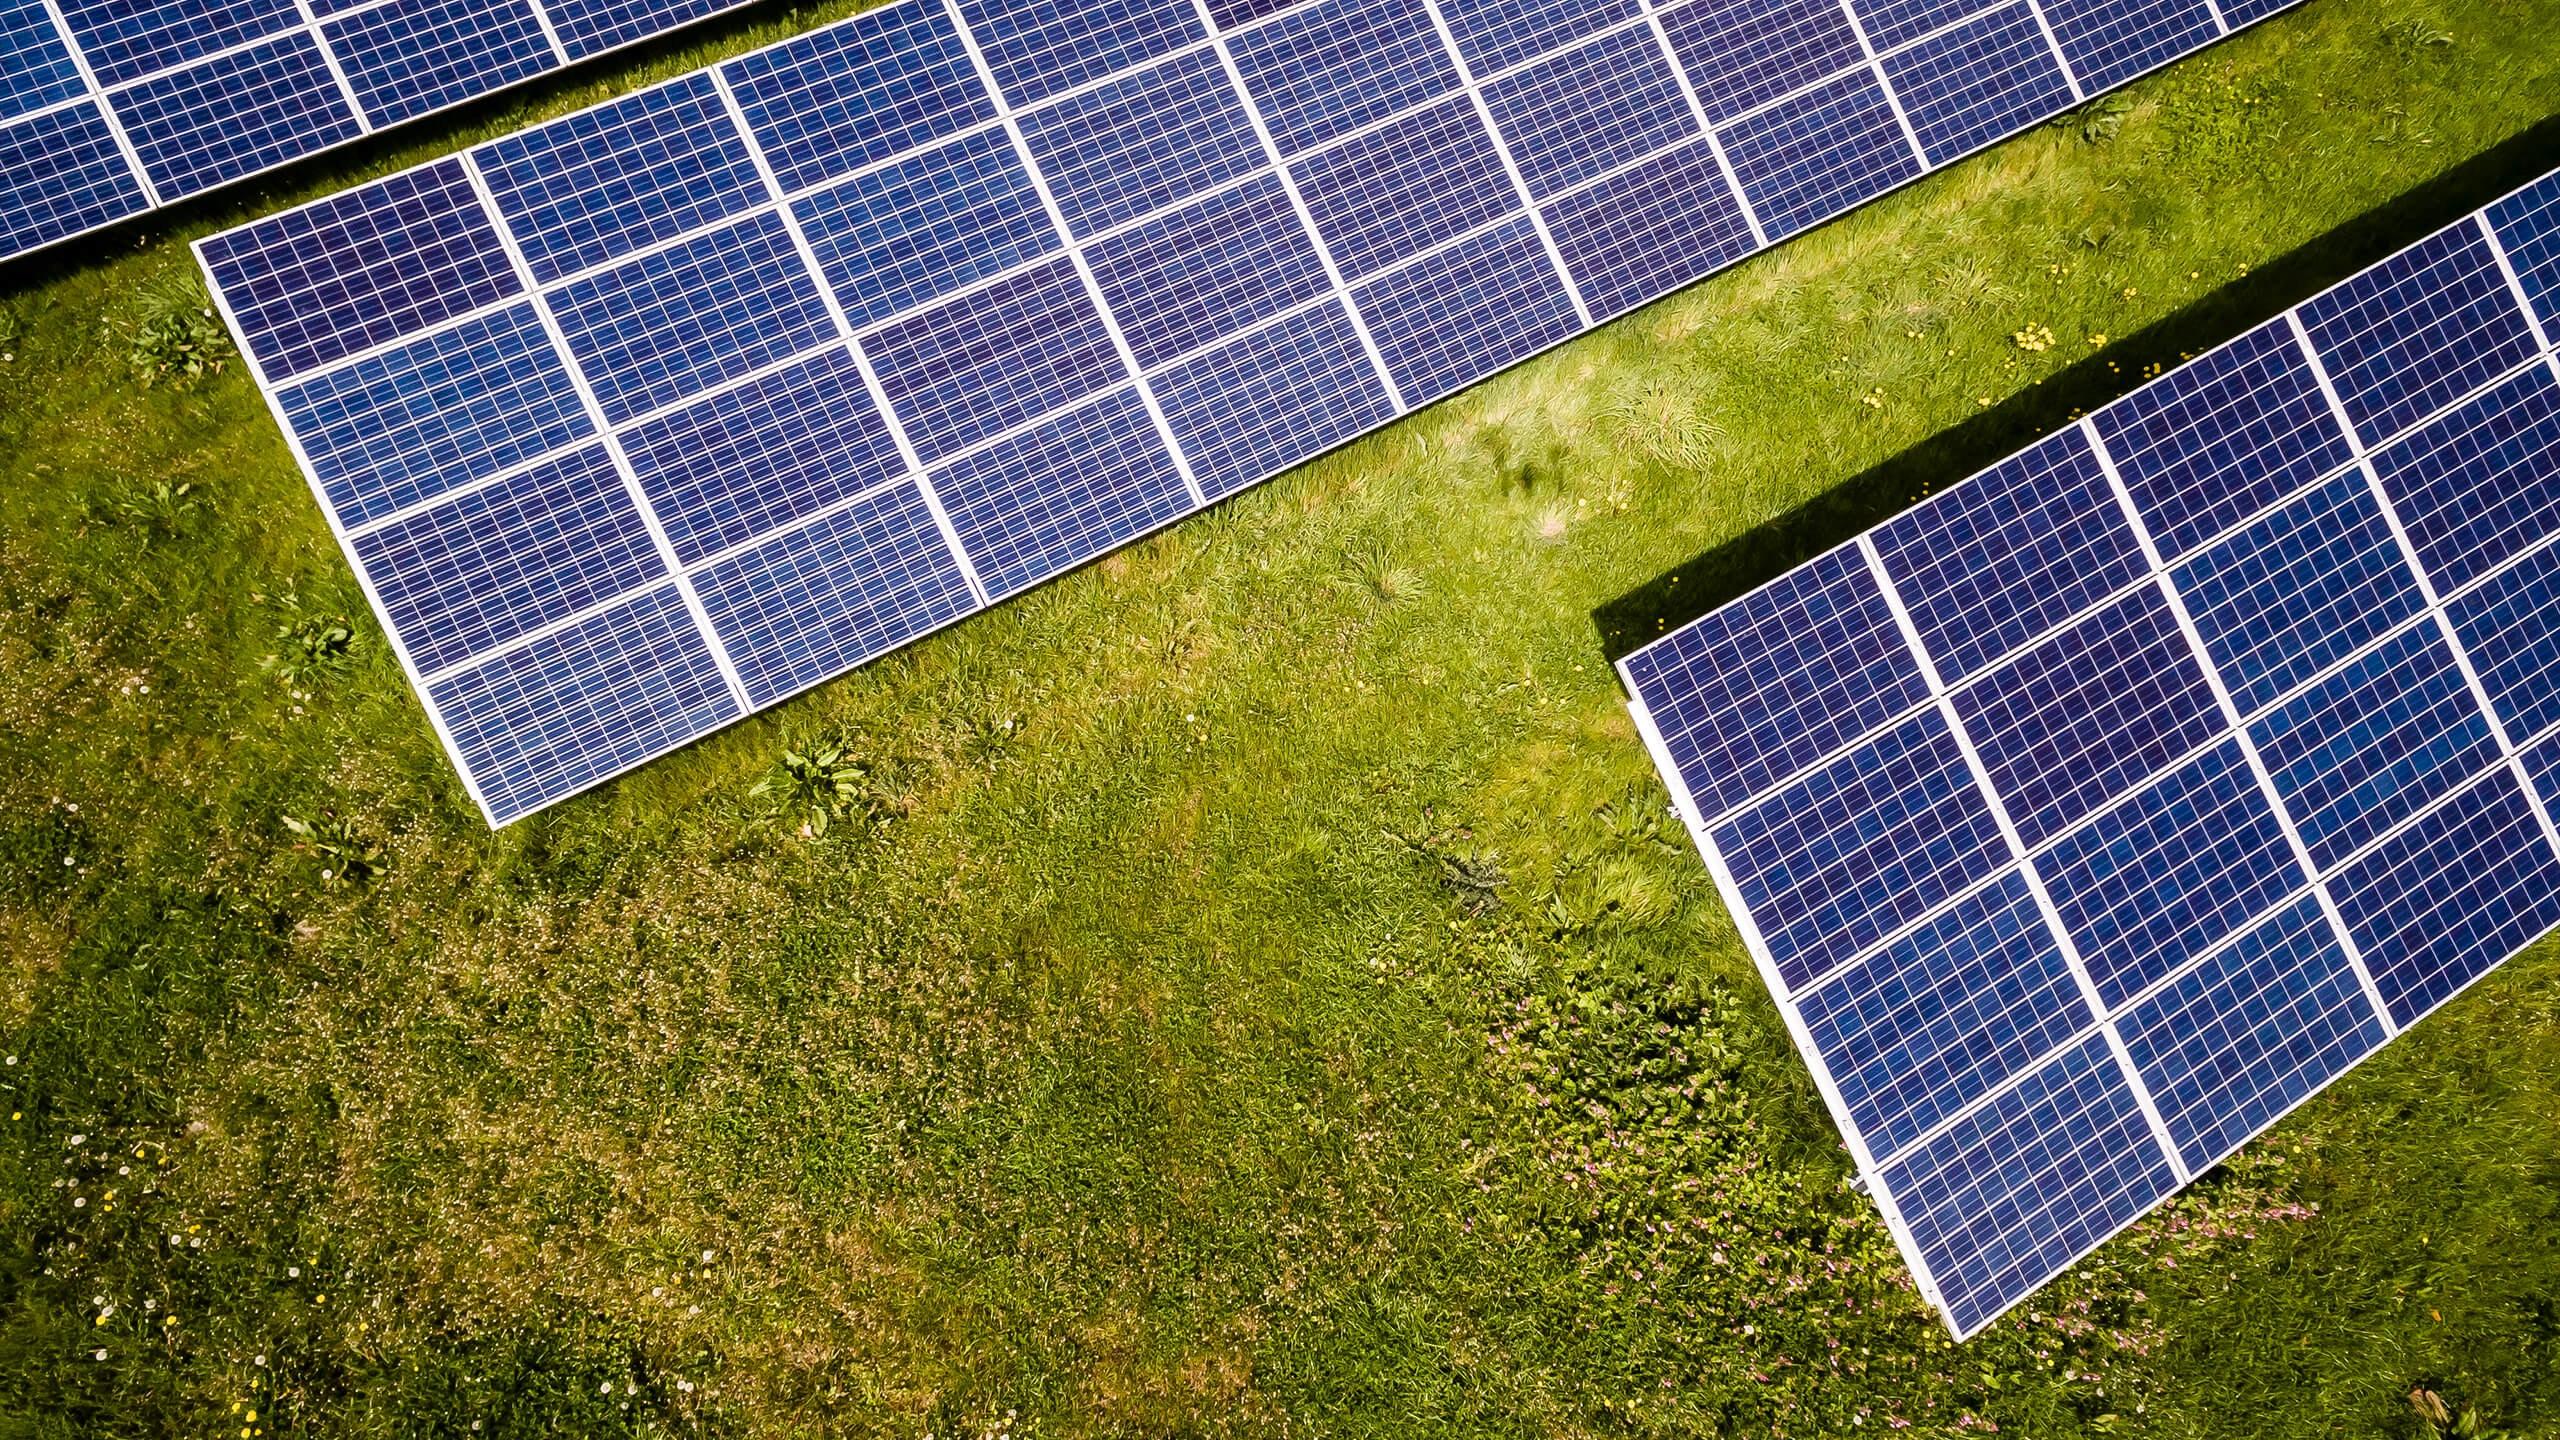 Comuni rinnovabili 2019, l'Italia cresce lentamente in energia pulita